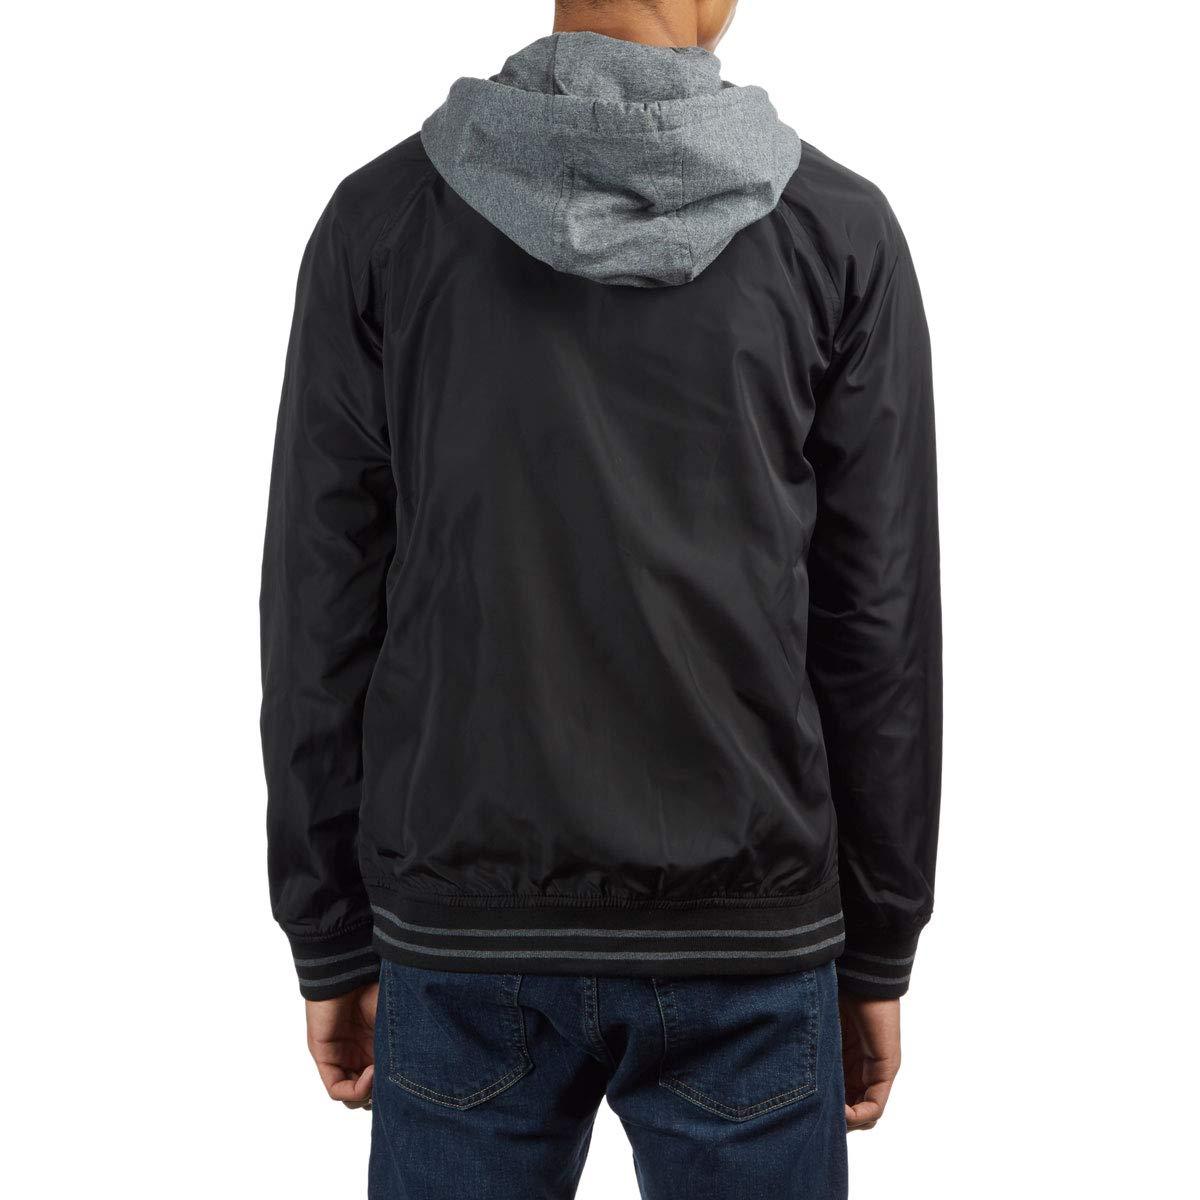 20b06c268 Primitive Lightweight Twofer Varsity Jacket - Black at Amazon Men's Clothing  store: